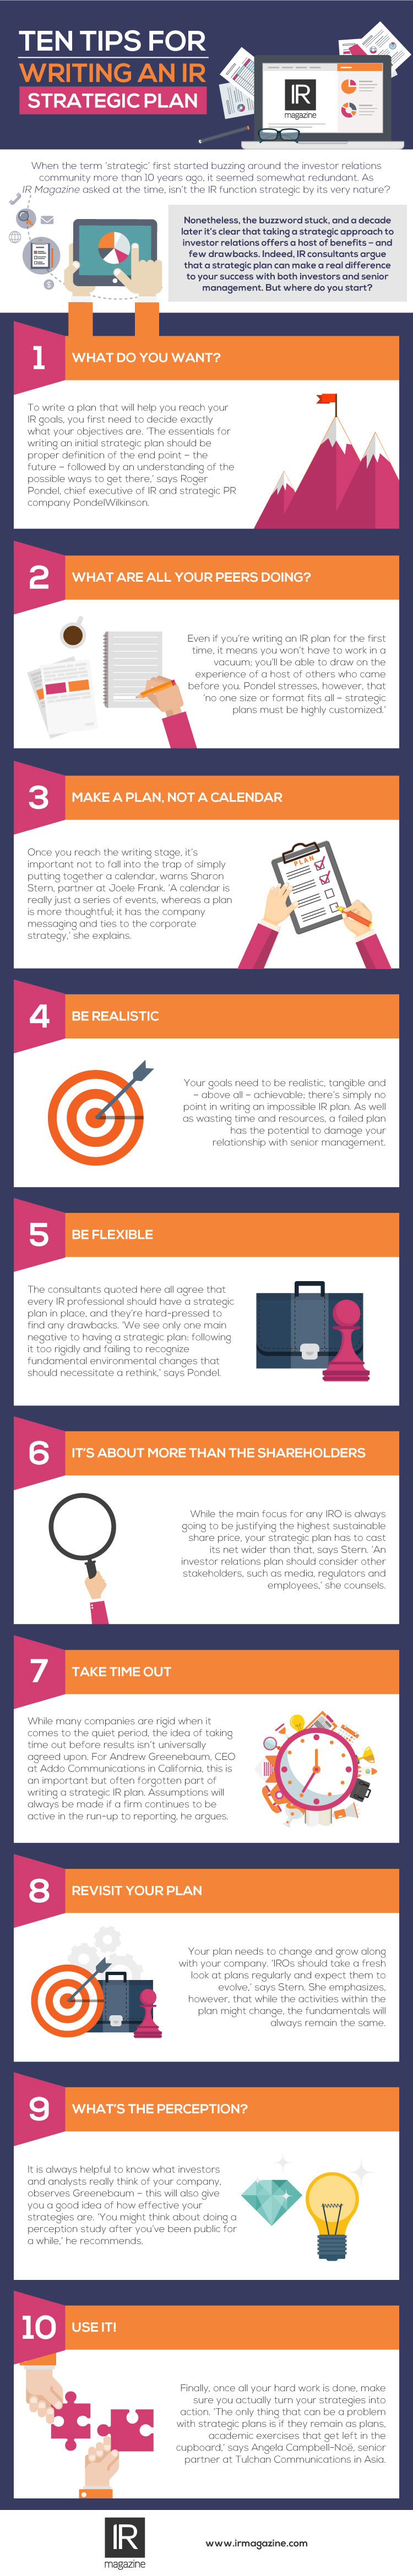 Infographic explains steps for writing strategic plan